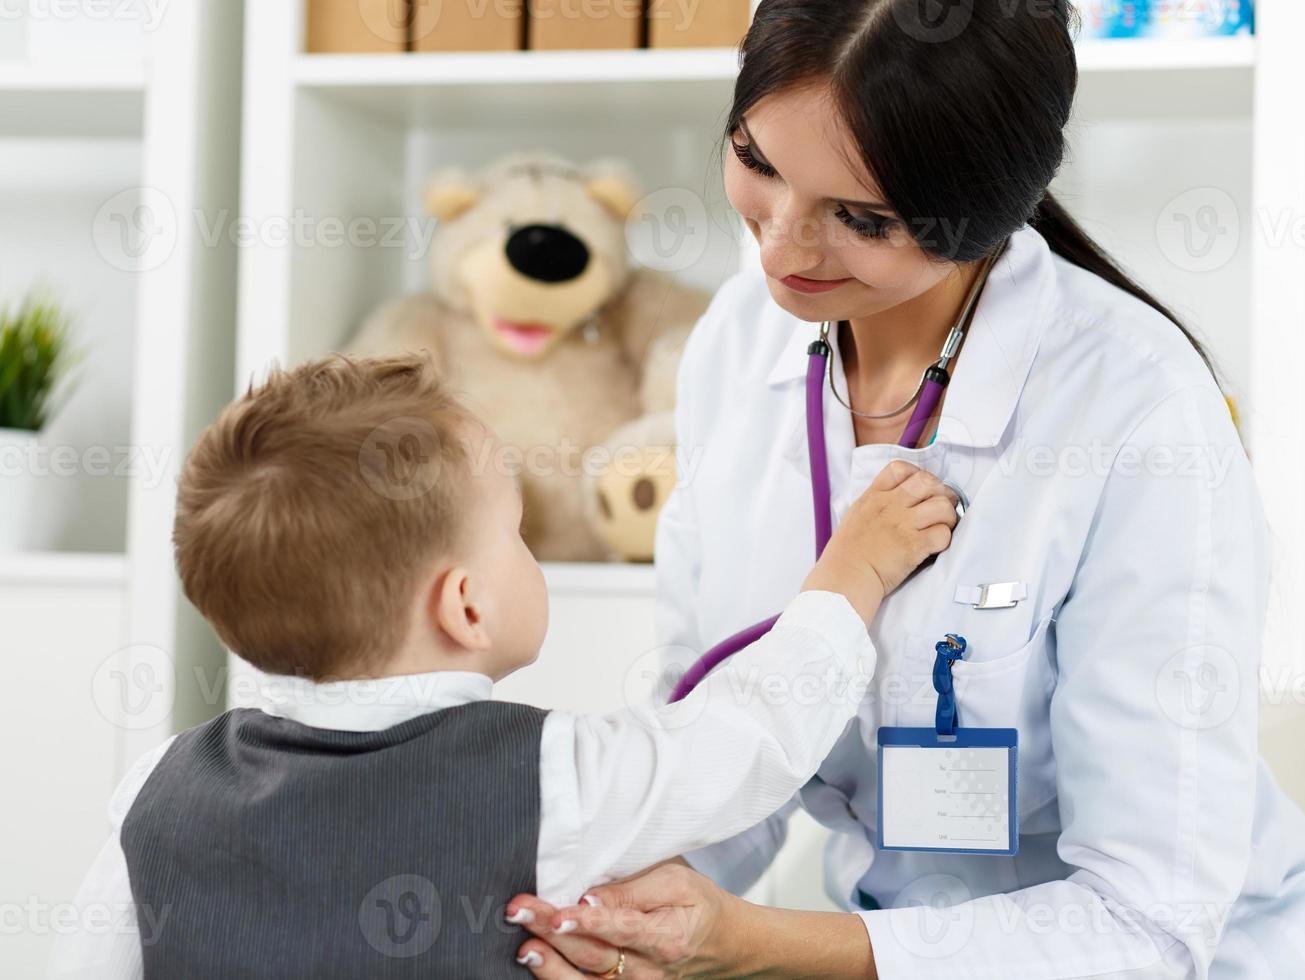 pediatrie medisch concept foto